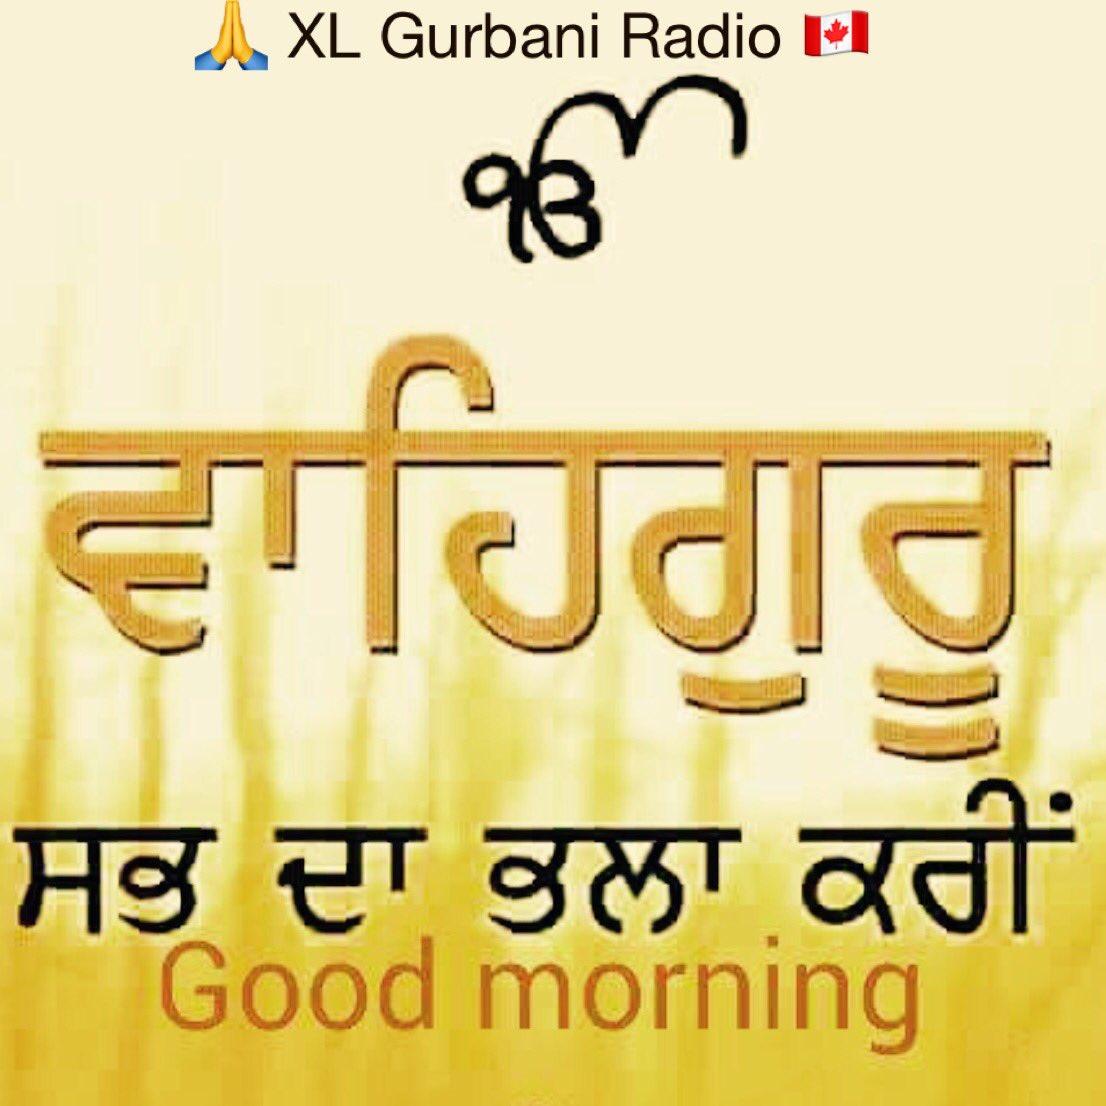 Xl Gurbani Radio On Twitter Pls Support 247 Sikh